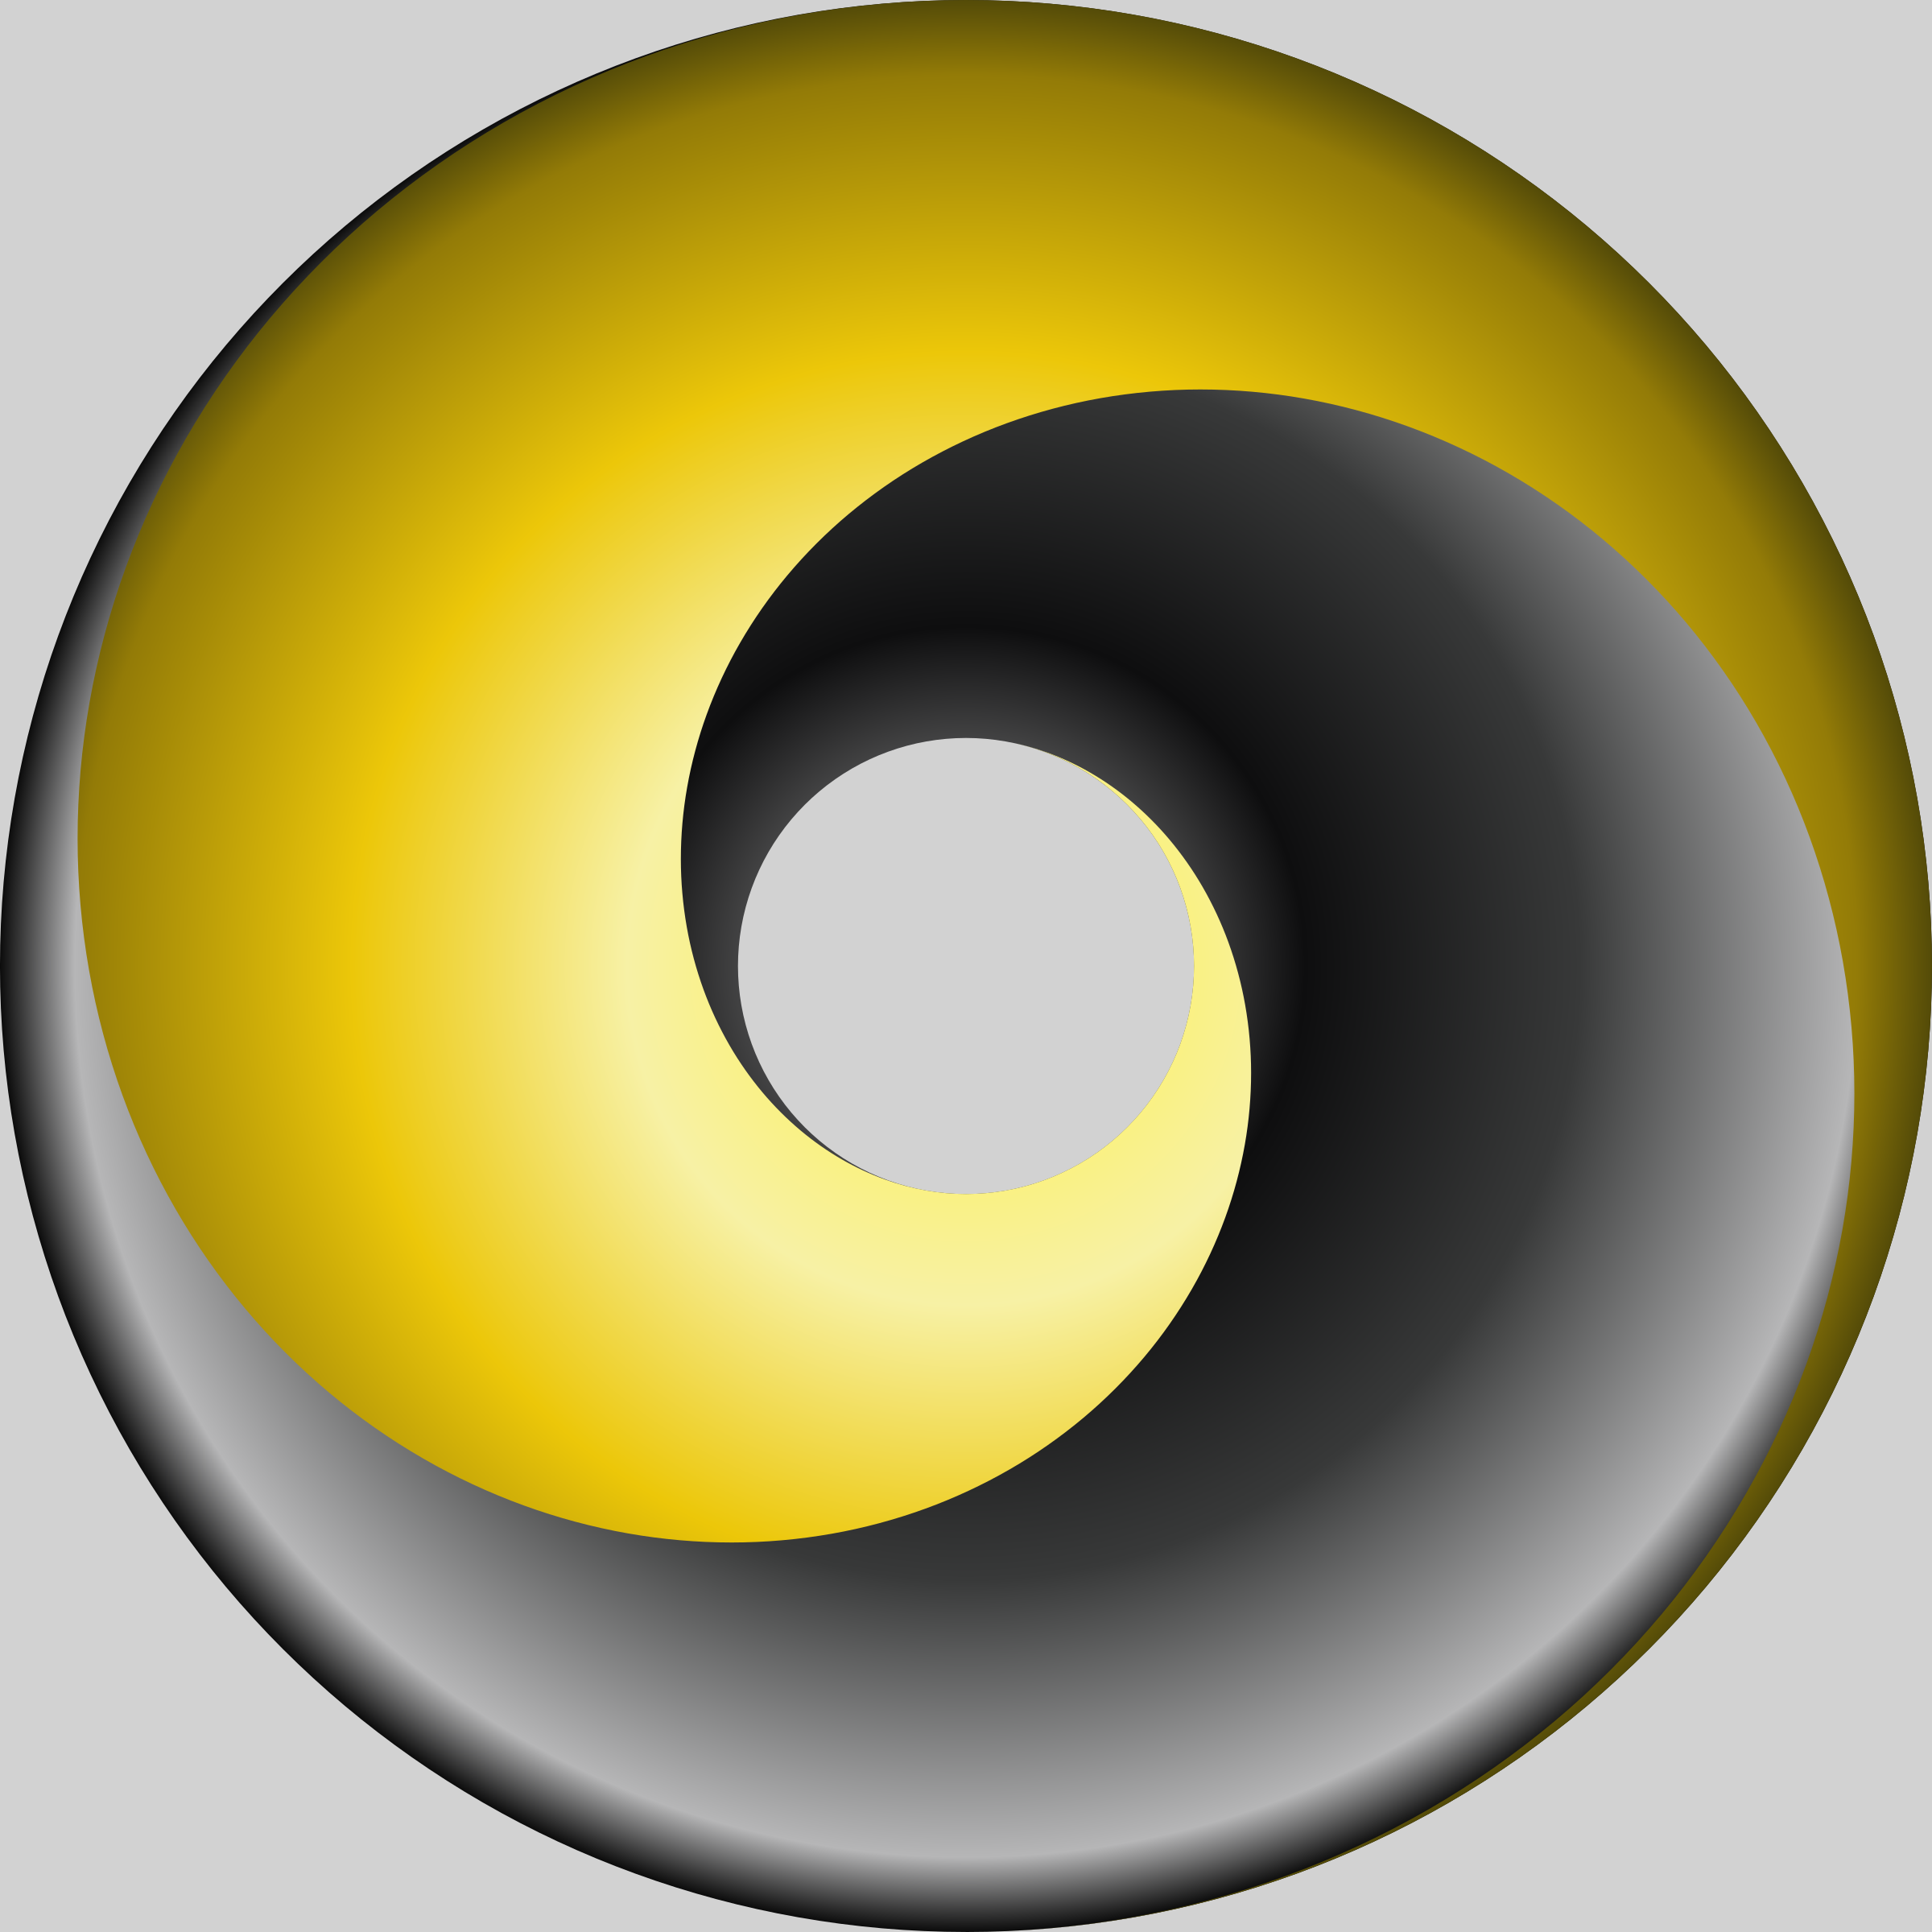 Circle clipart yellow circle Circle Clipart circle evolvent evolvent